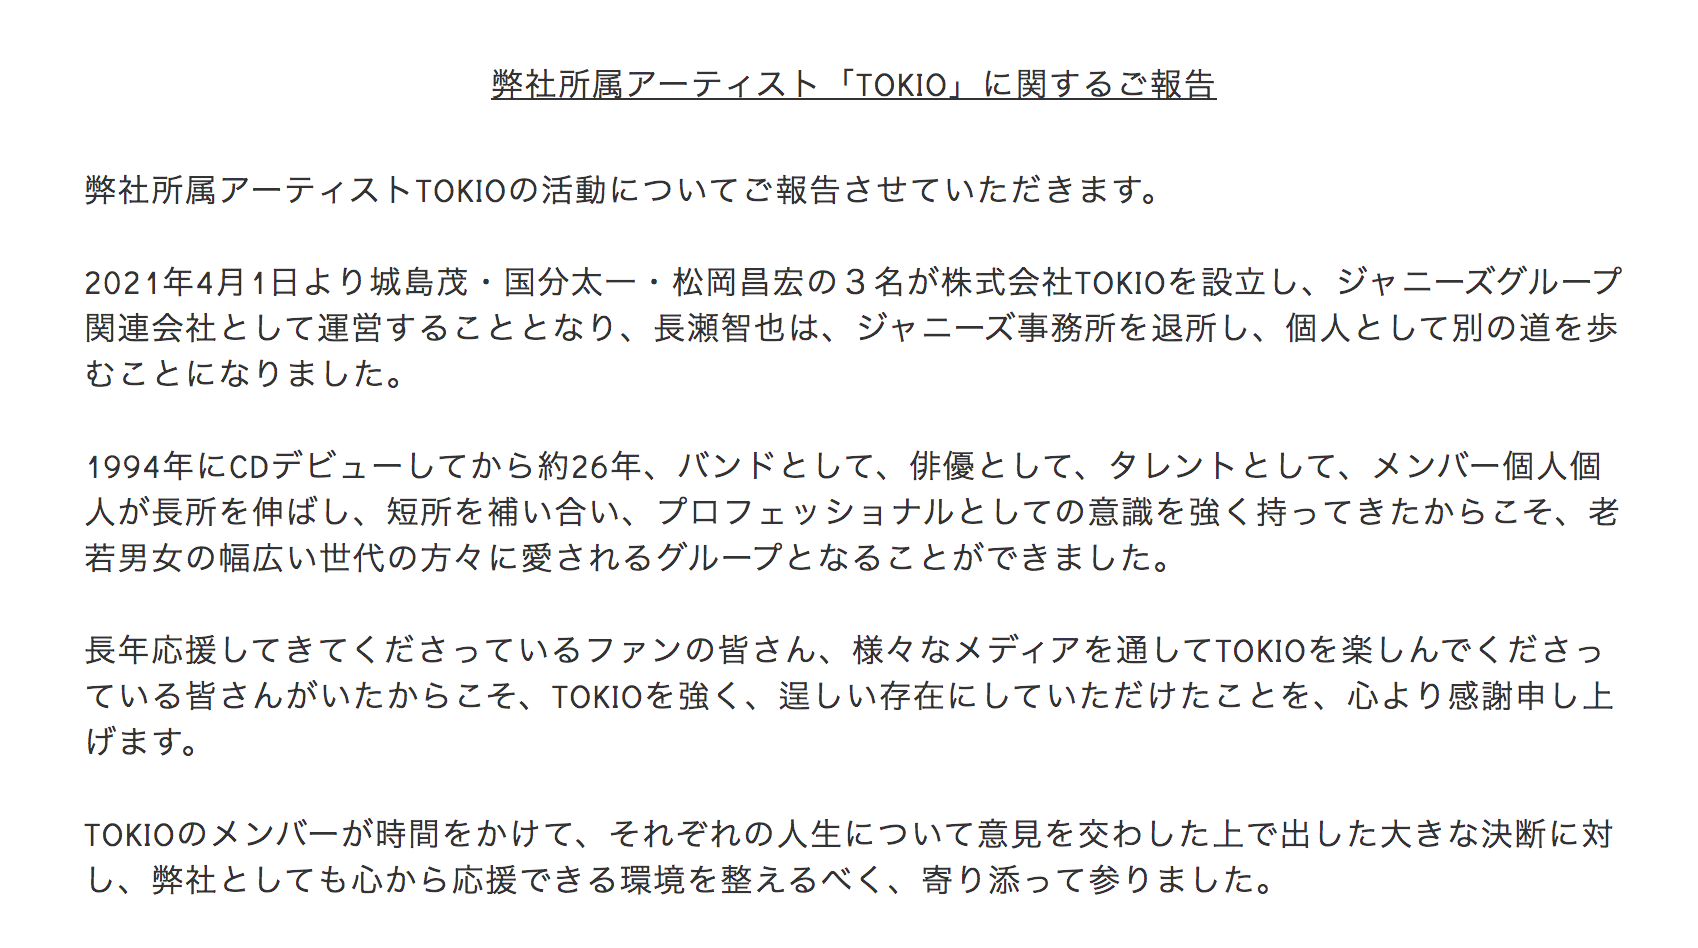 TOKIO  長瀬智也 宣布明年3月底退社 「這三十年來,被大家喜愛著,我度過了人生中最幸福的時光」